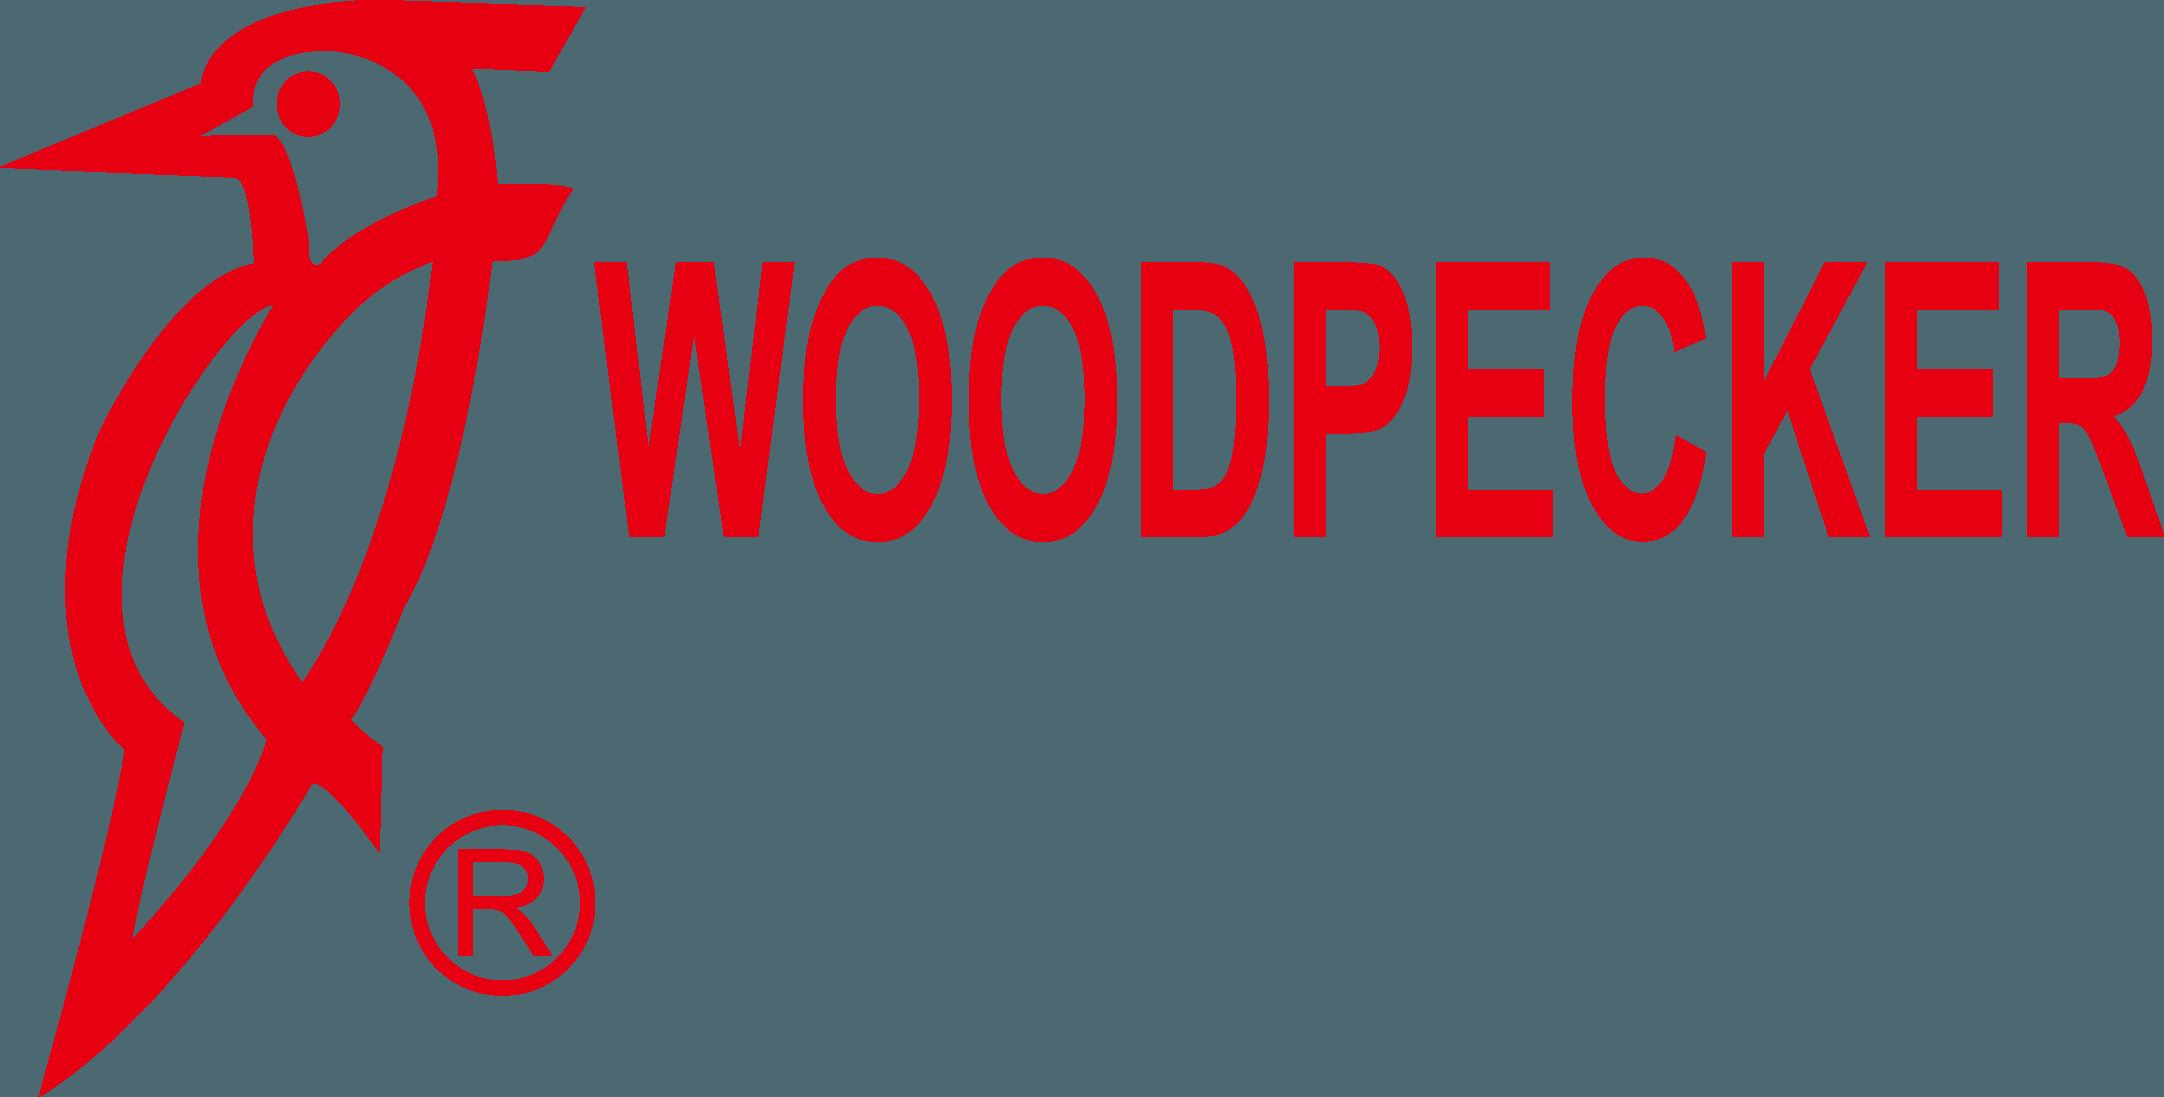 banerwoodpecker